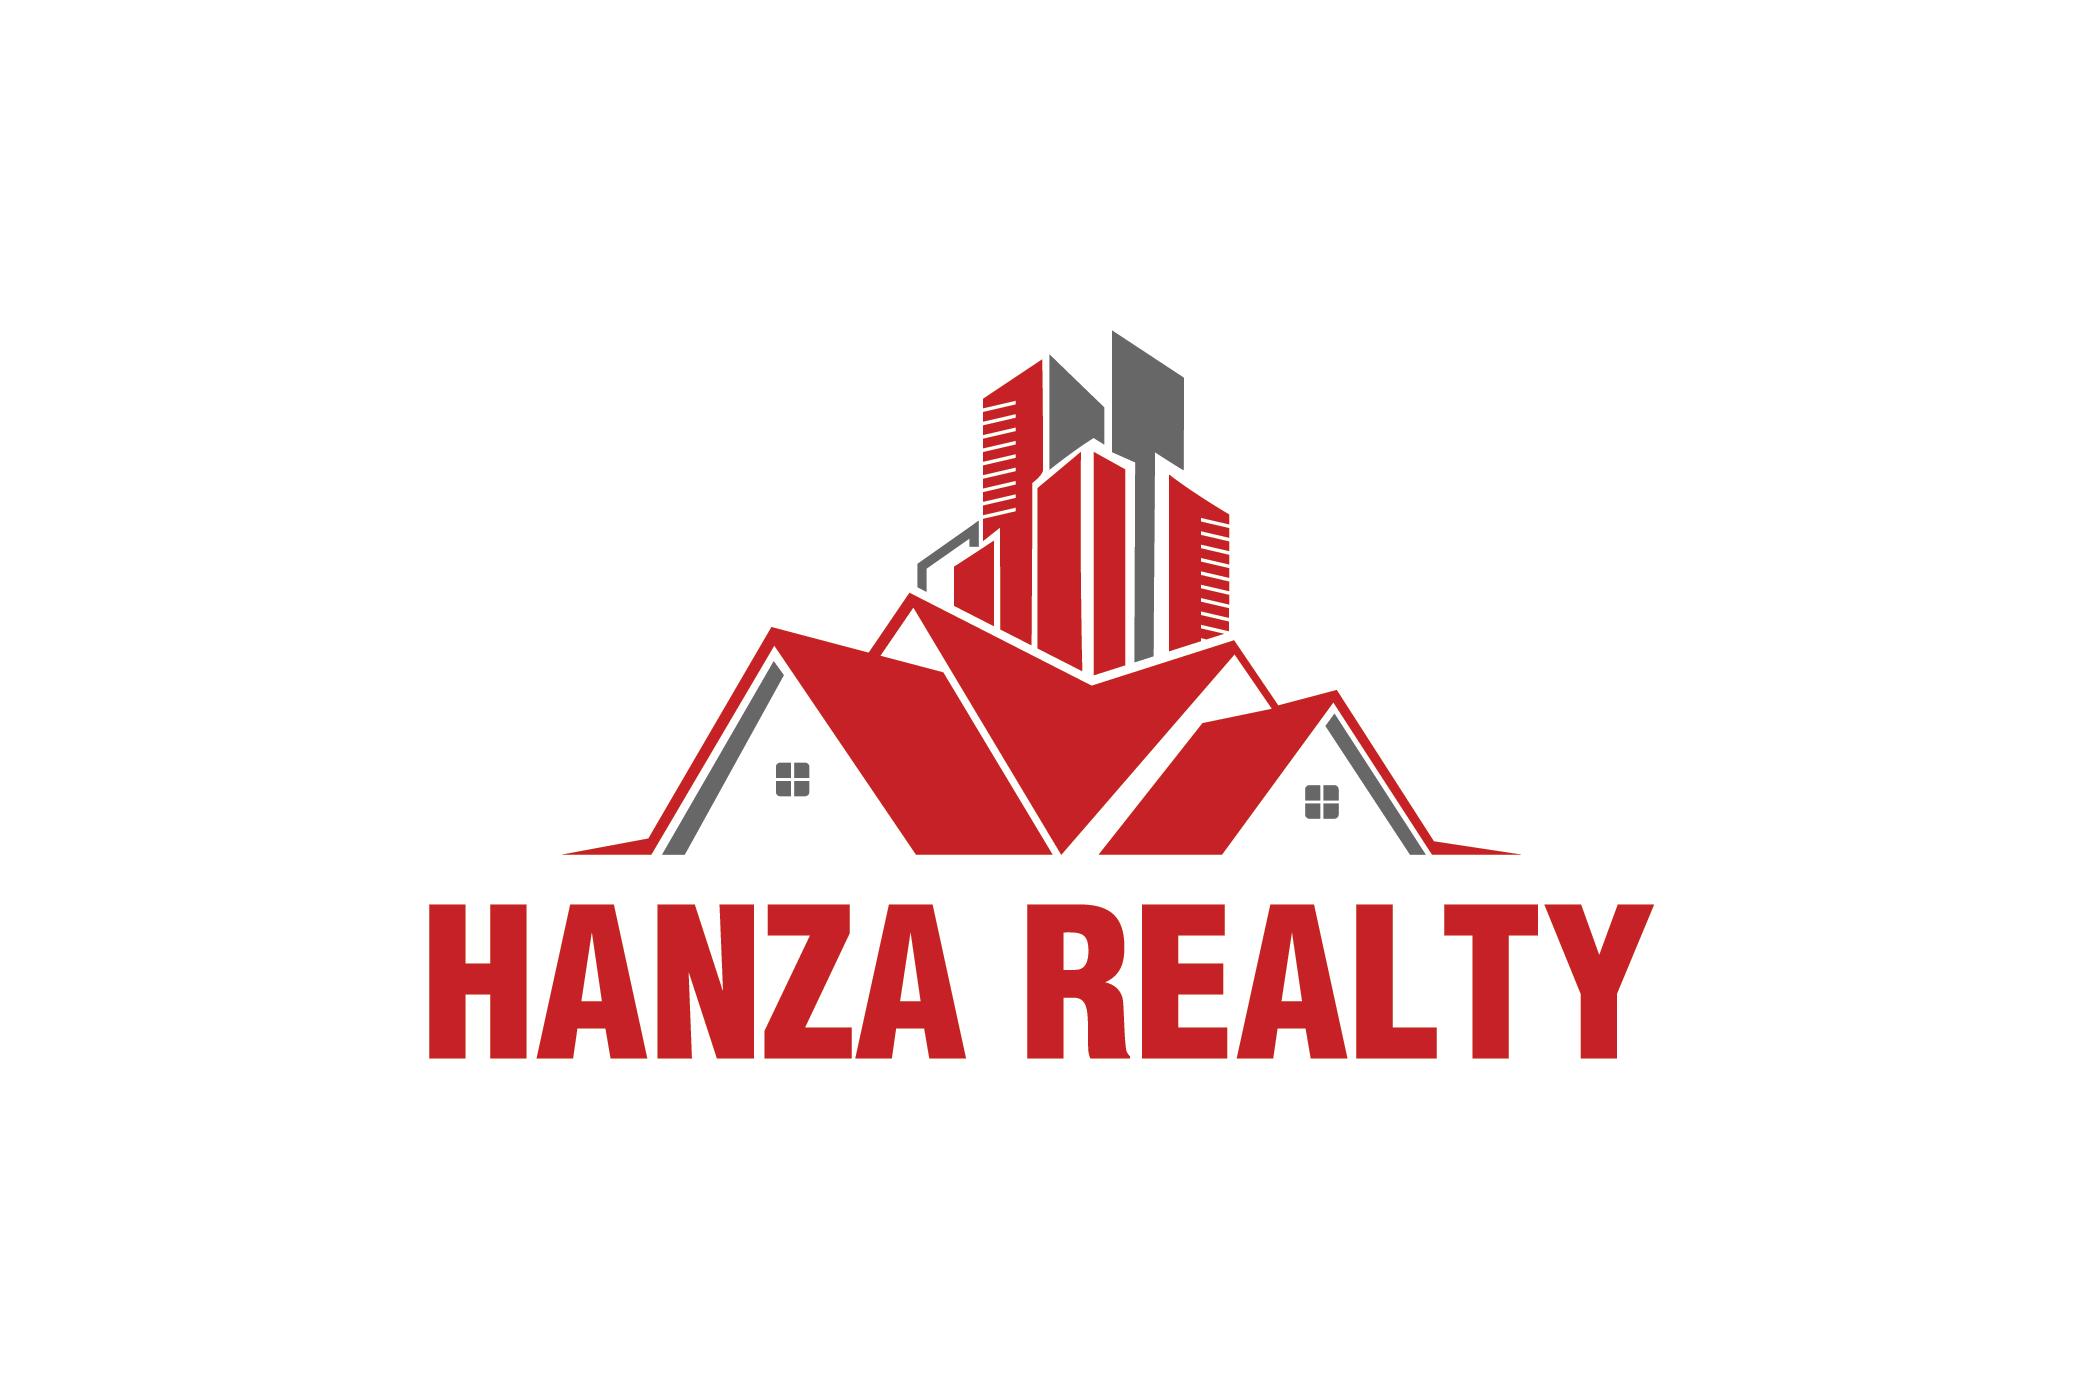 Logo Design by Raheel Baloch - Entry No. 112 in the Logo Design Contest Logo Design for Hanza Realty.